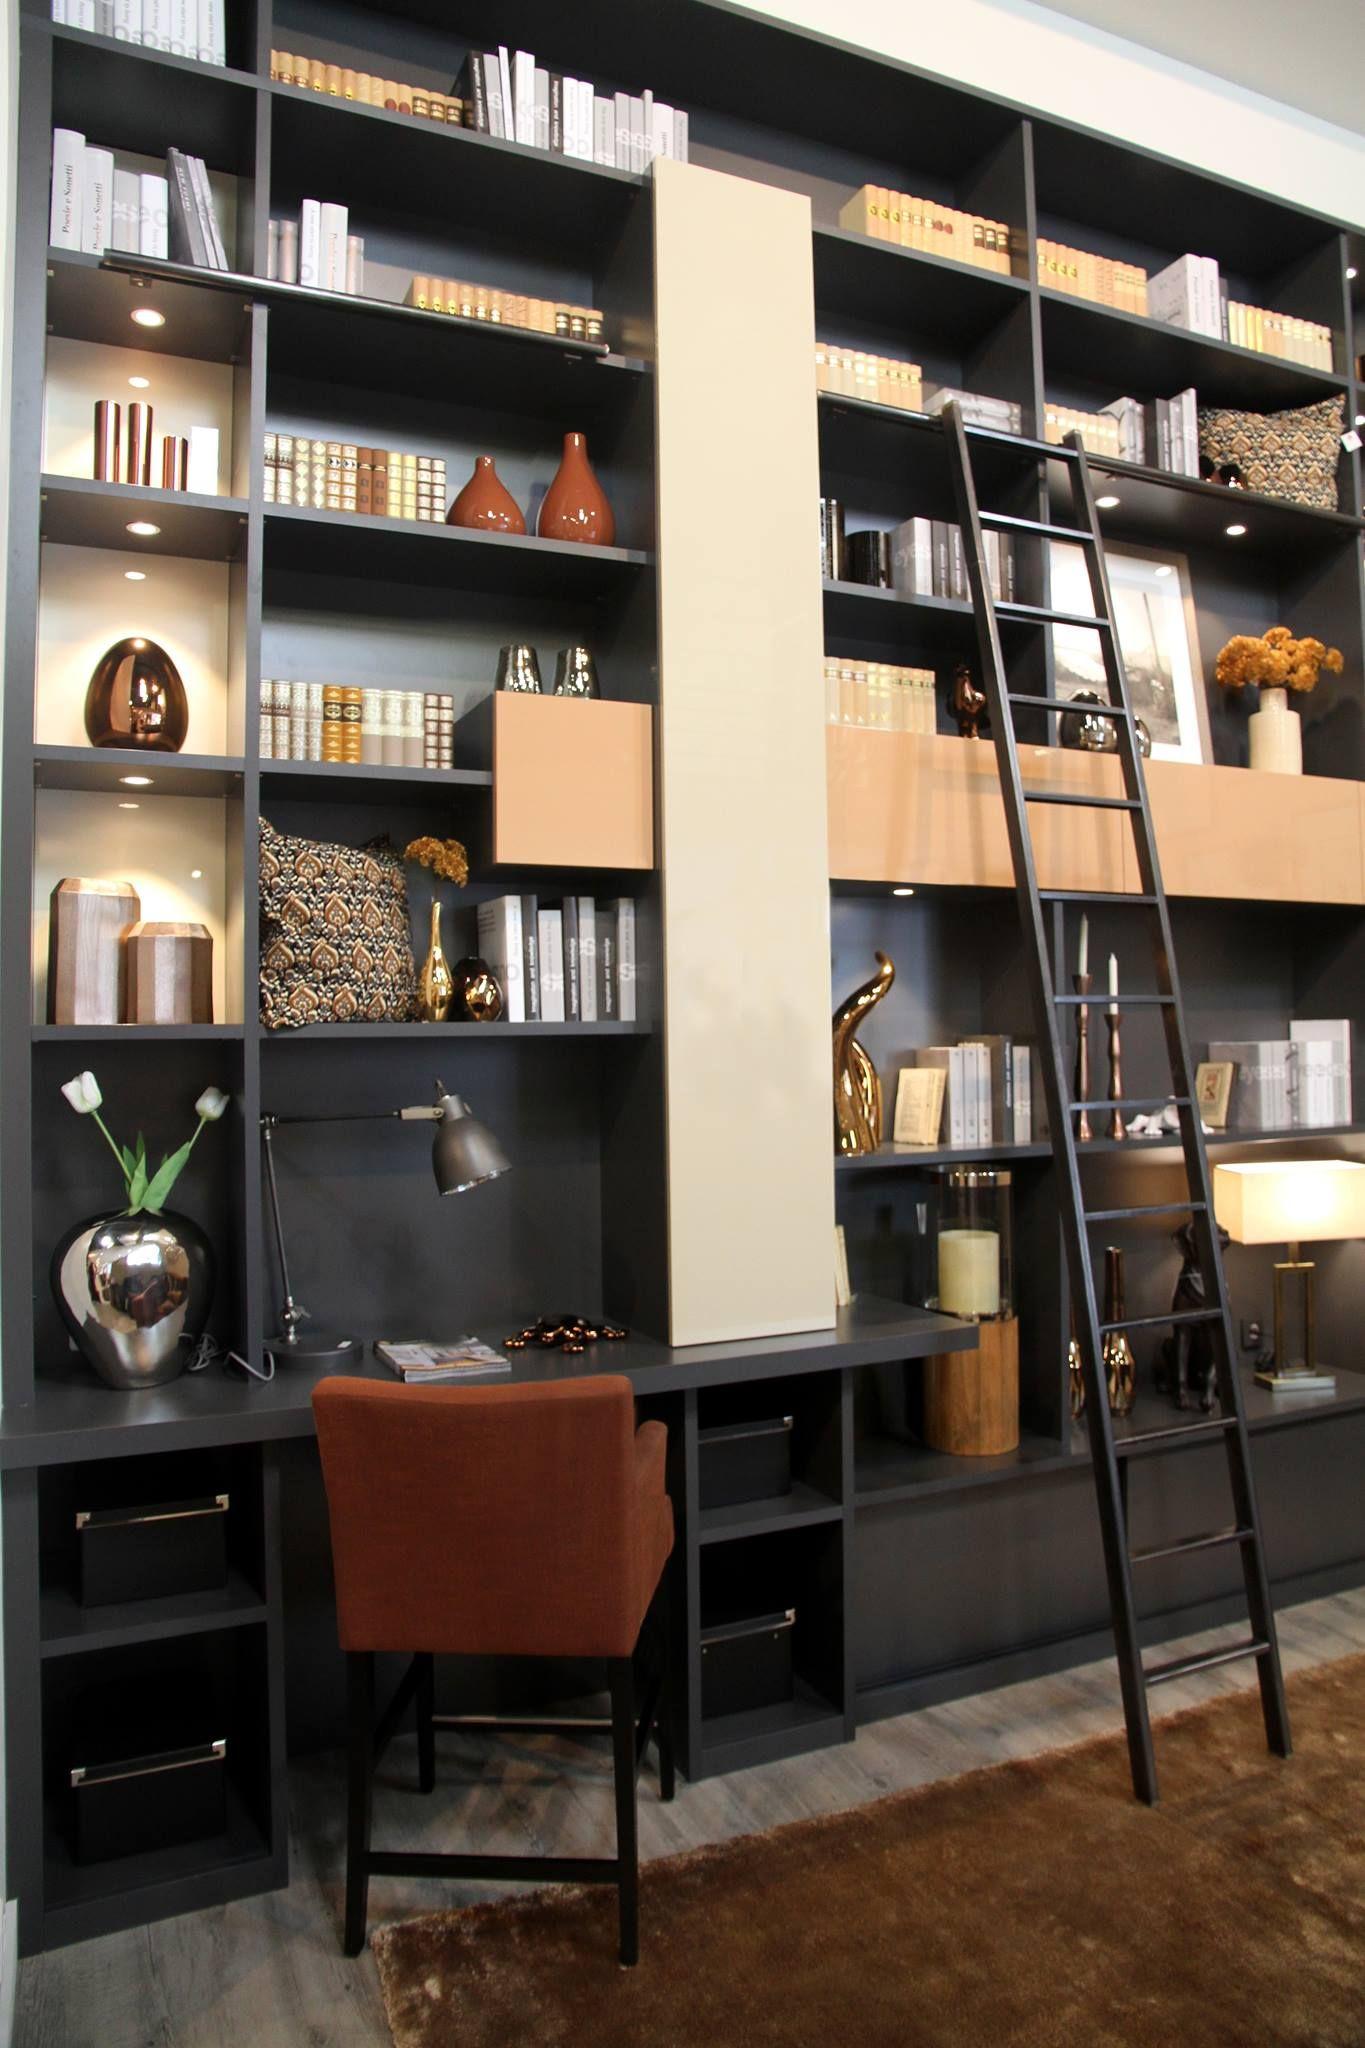 biblioth que sur mesure m lamin anthracite et mdf laqu. Black Bedroom Furniture Sets. Home Design Ideas